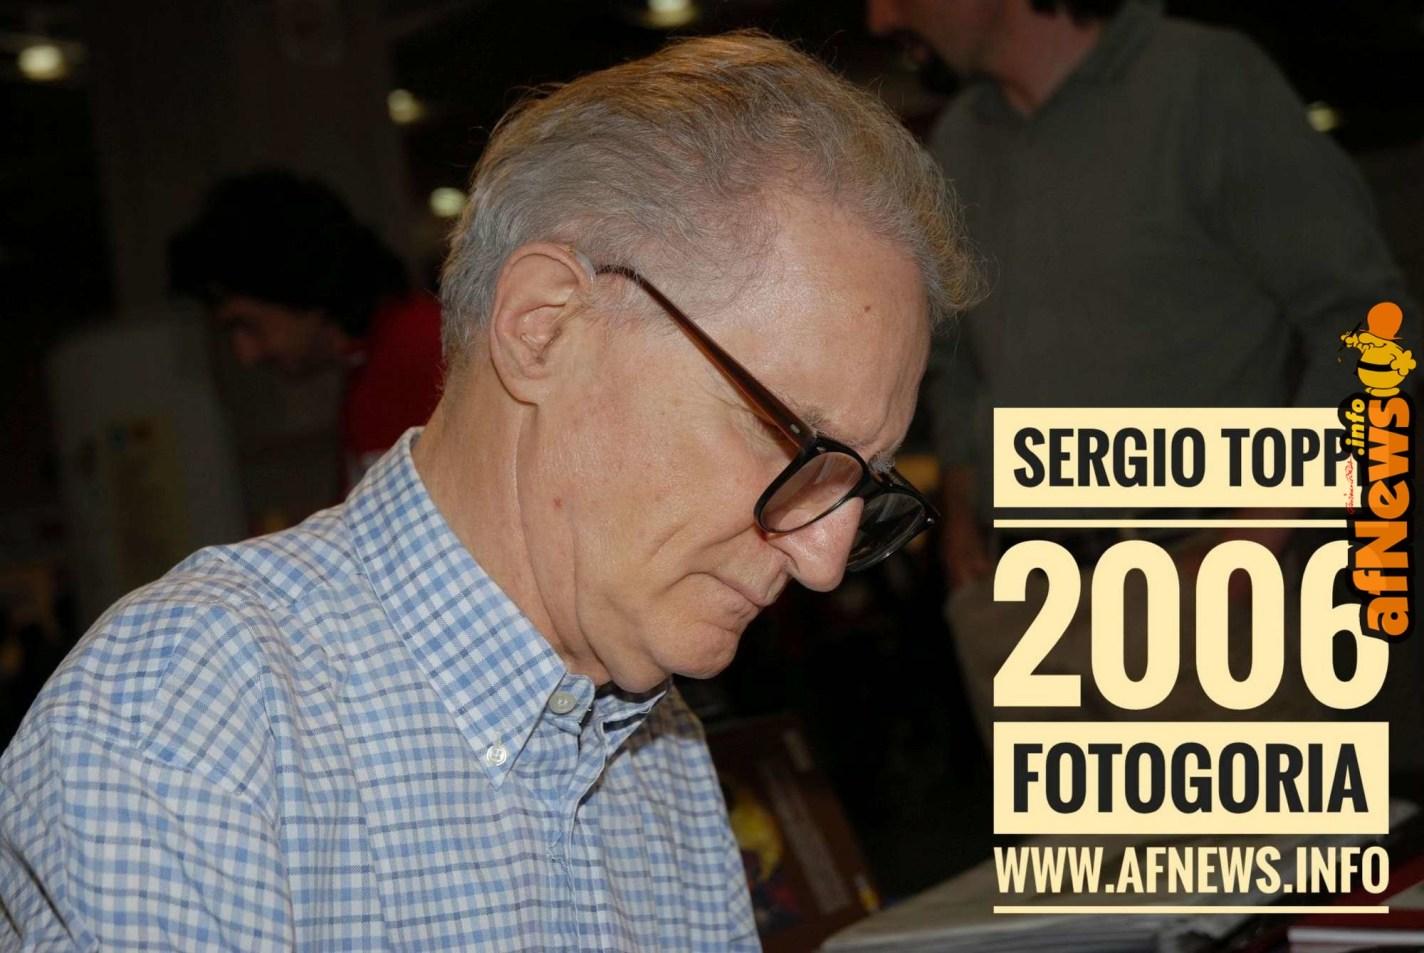 DSC_3262 Sergio Toppi-01-afnews